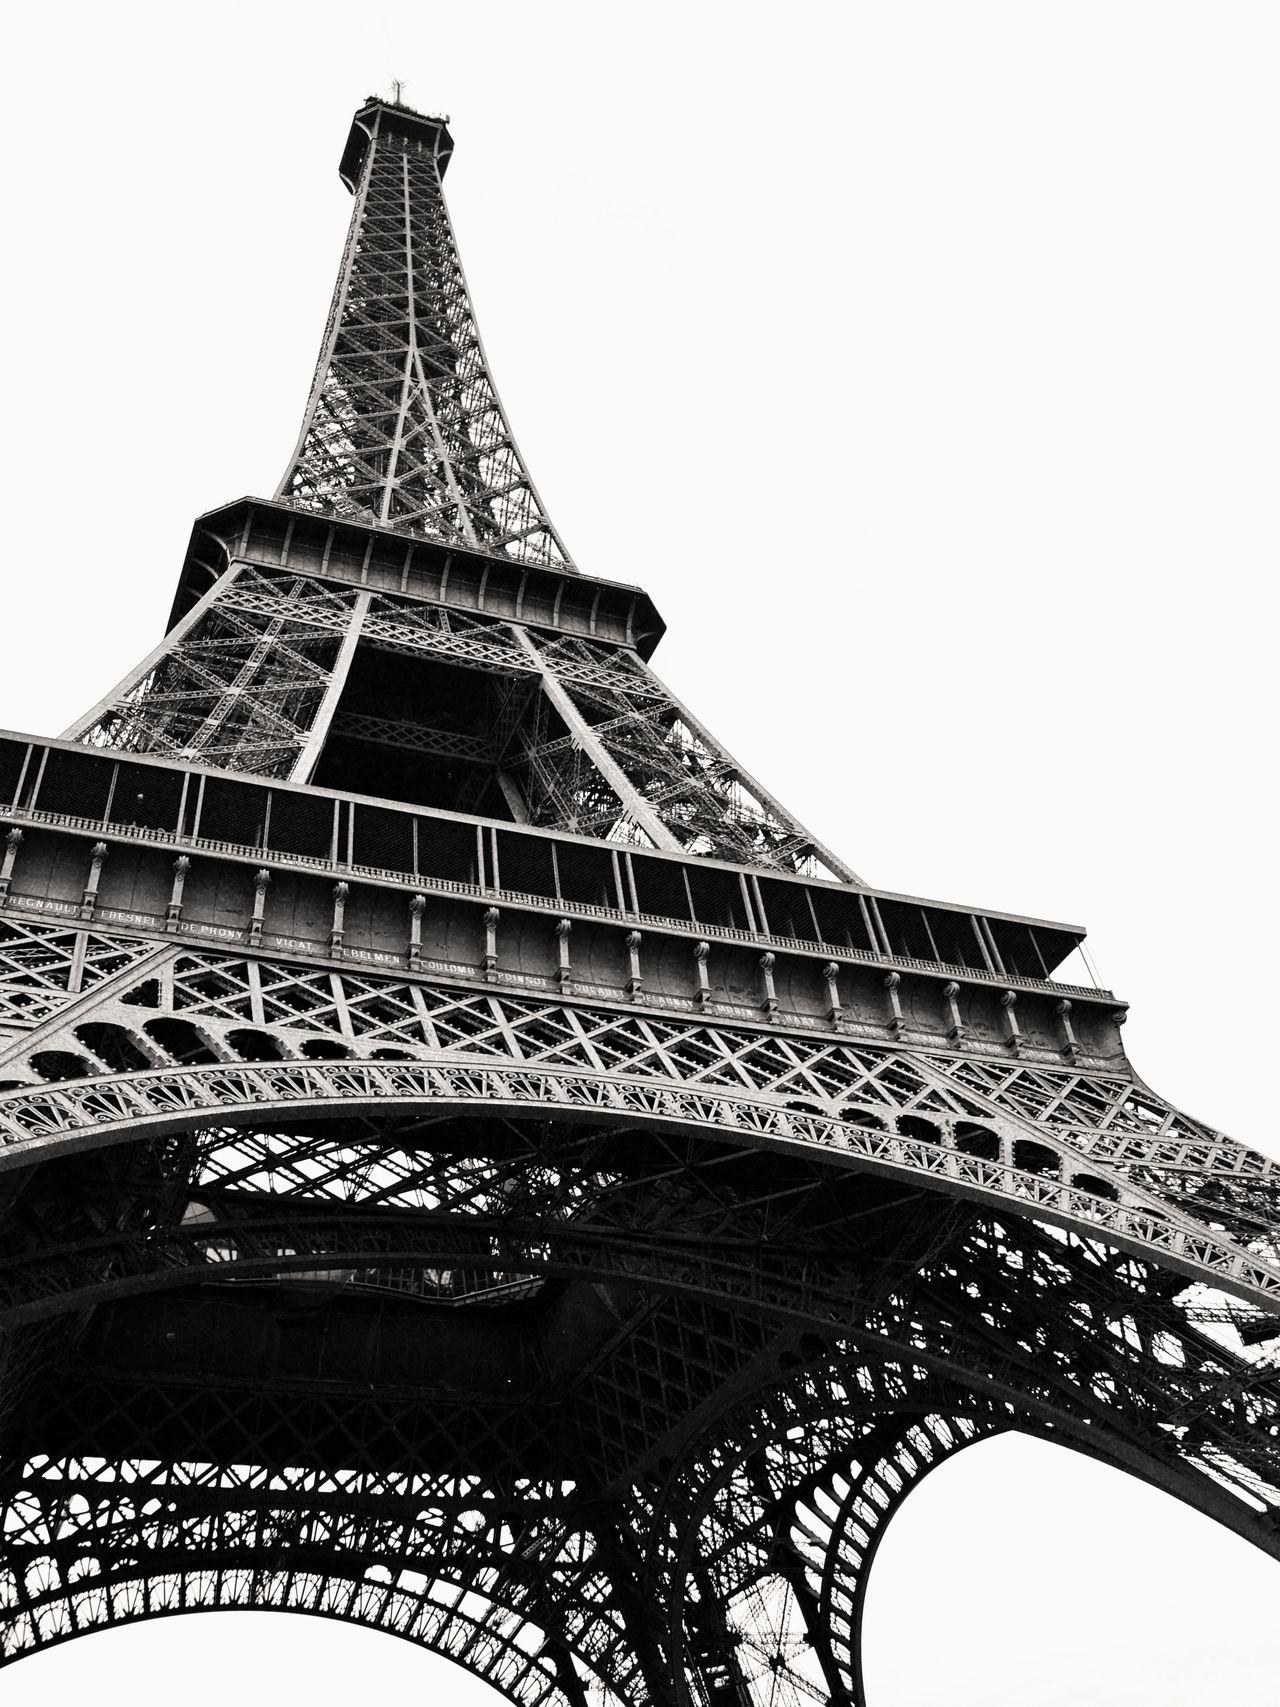 Eiffel tower B&W Architecture Black And White Built Structure City Eiffel Tower Monument No People Paris Tower Travel Destinations